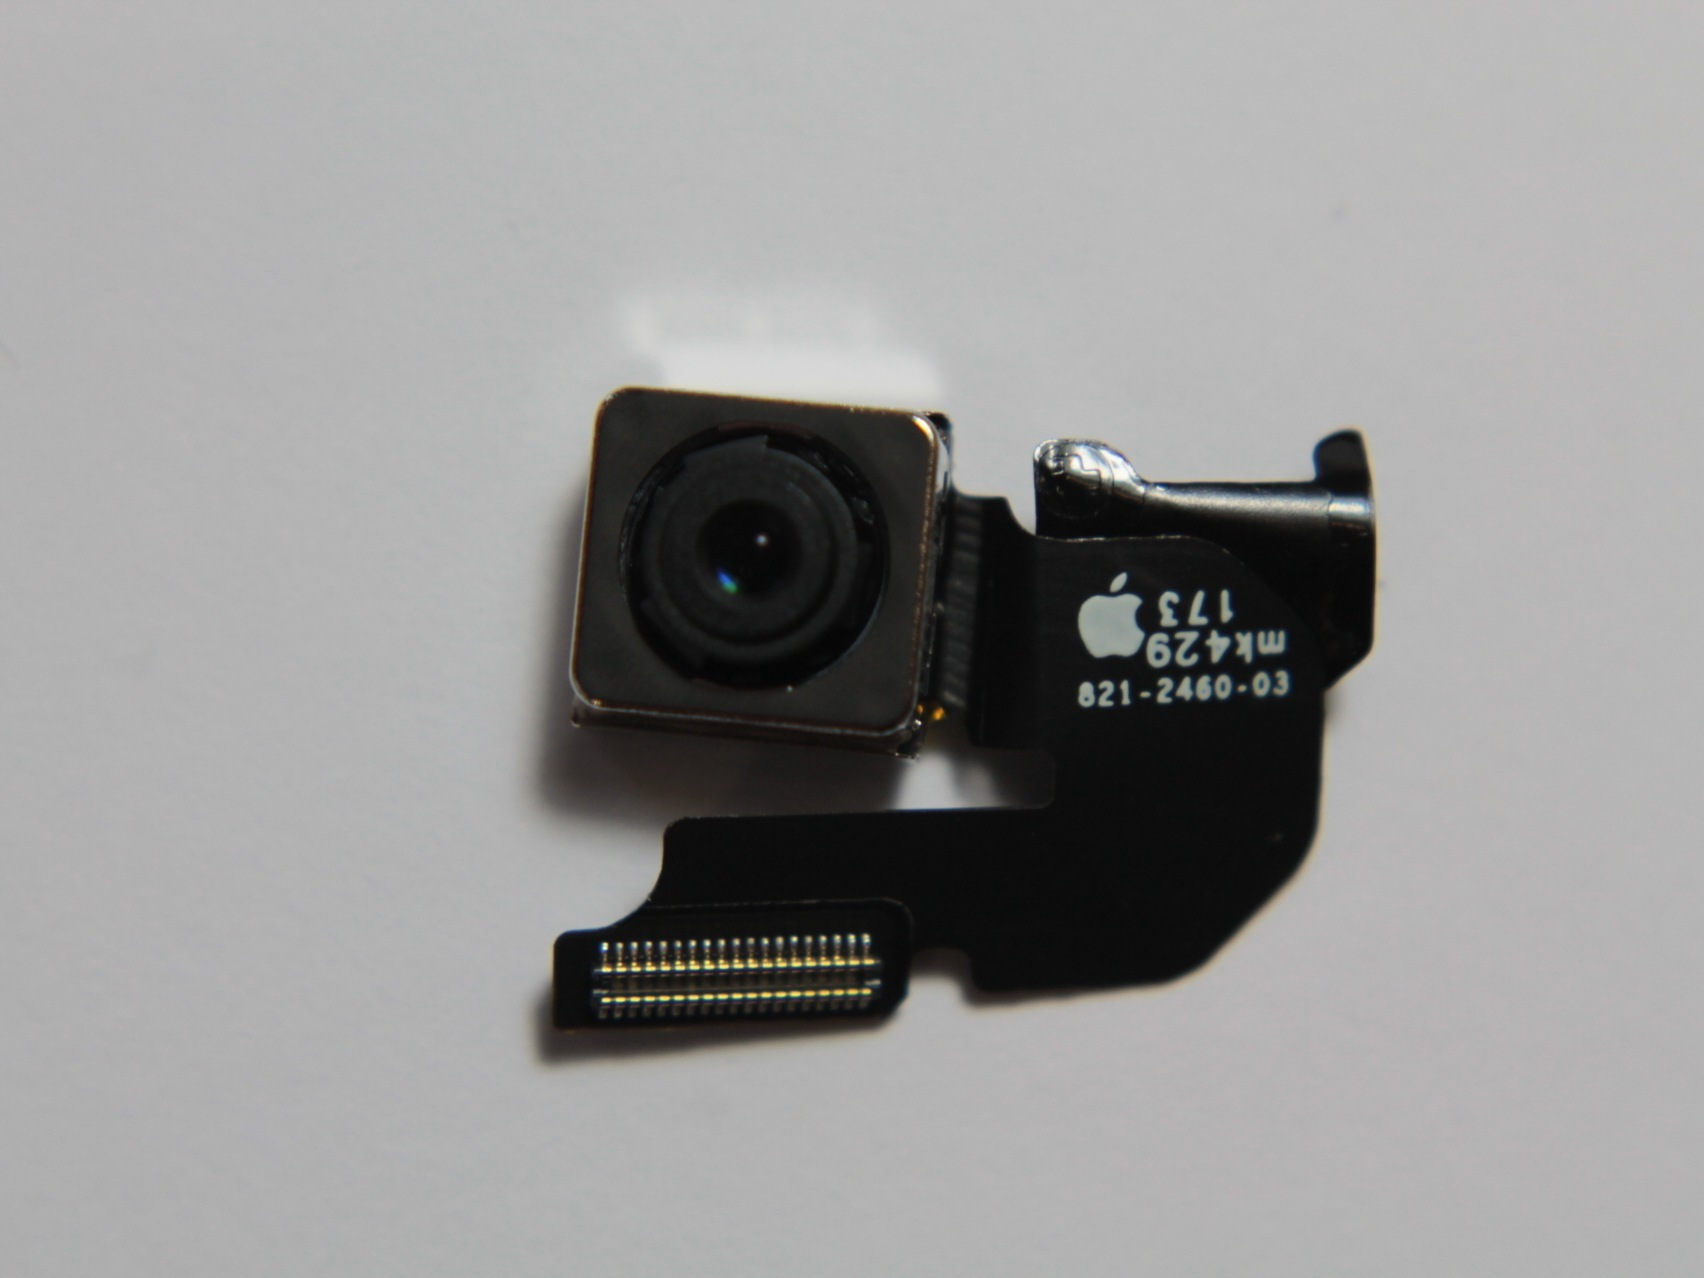 Camera of iPhone 6